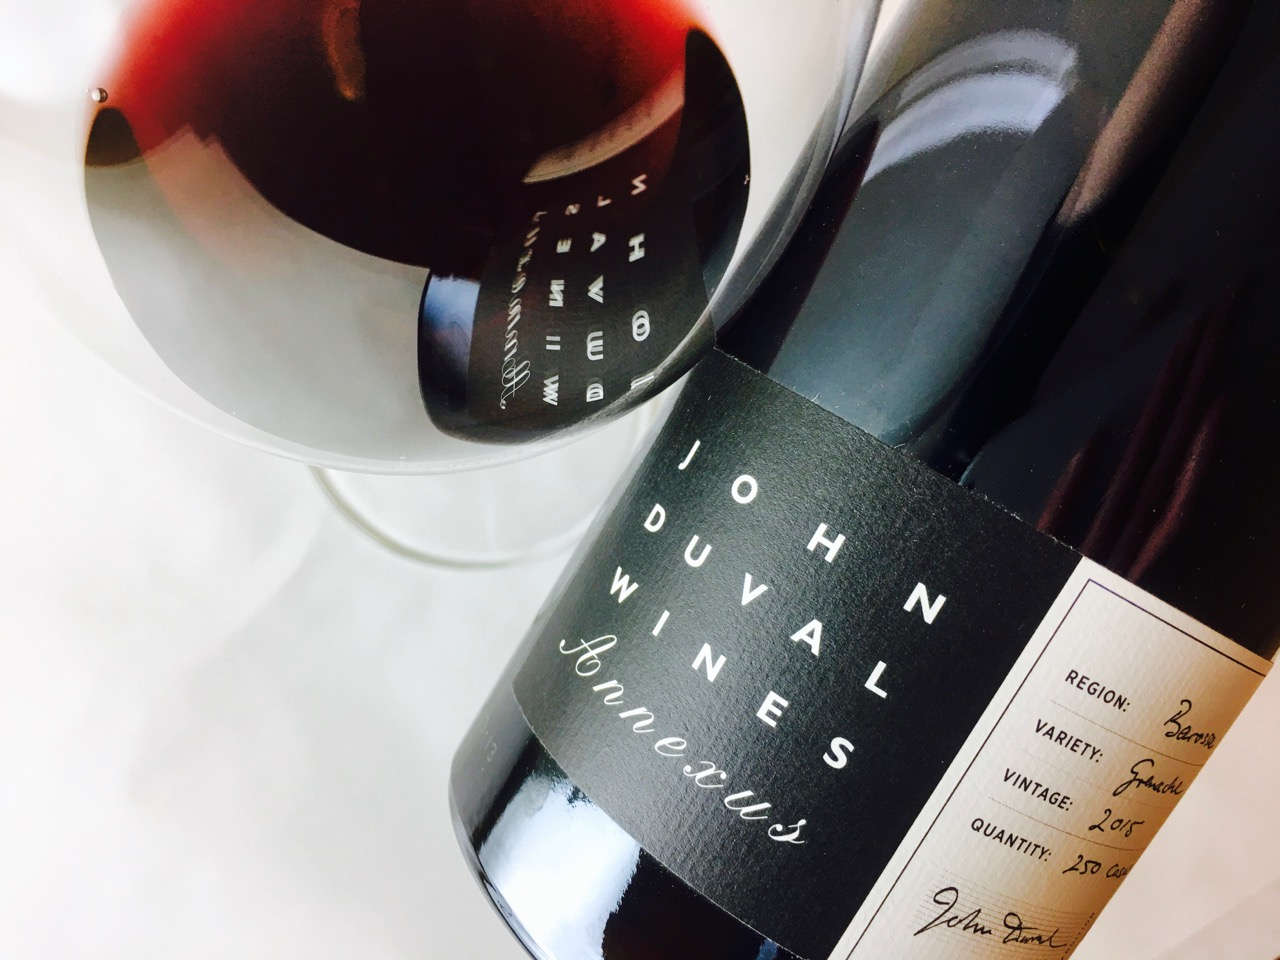 2015 John Duval Wines Grenache Annexus Barossa South Australia